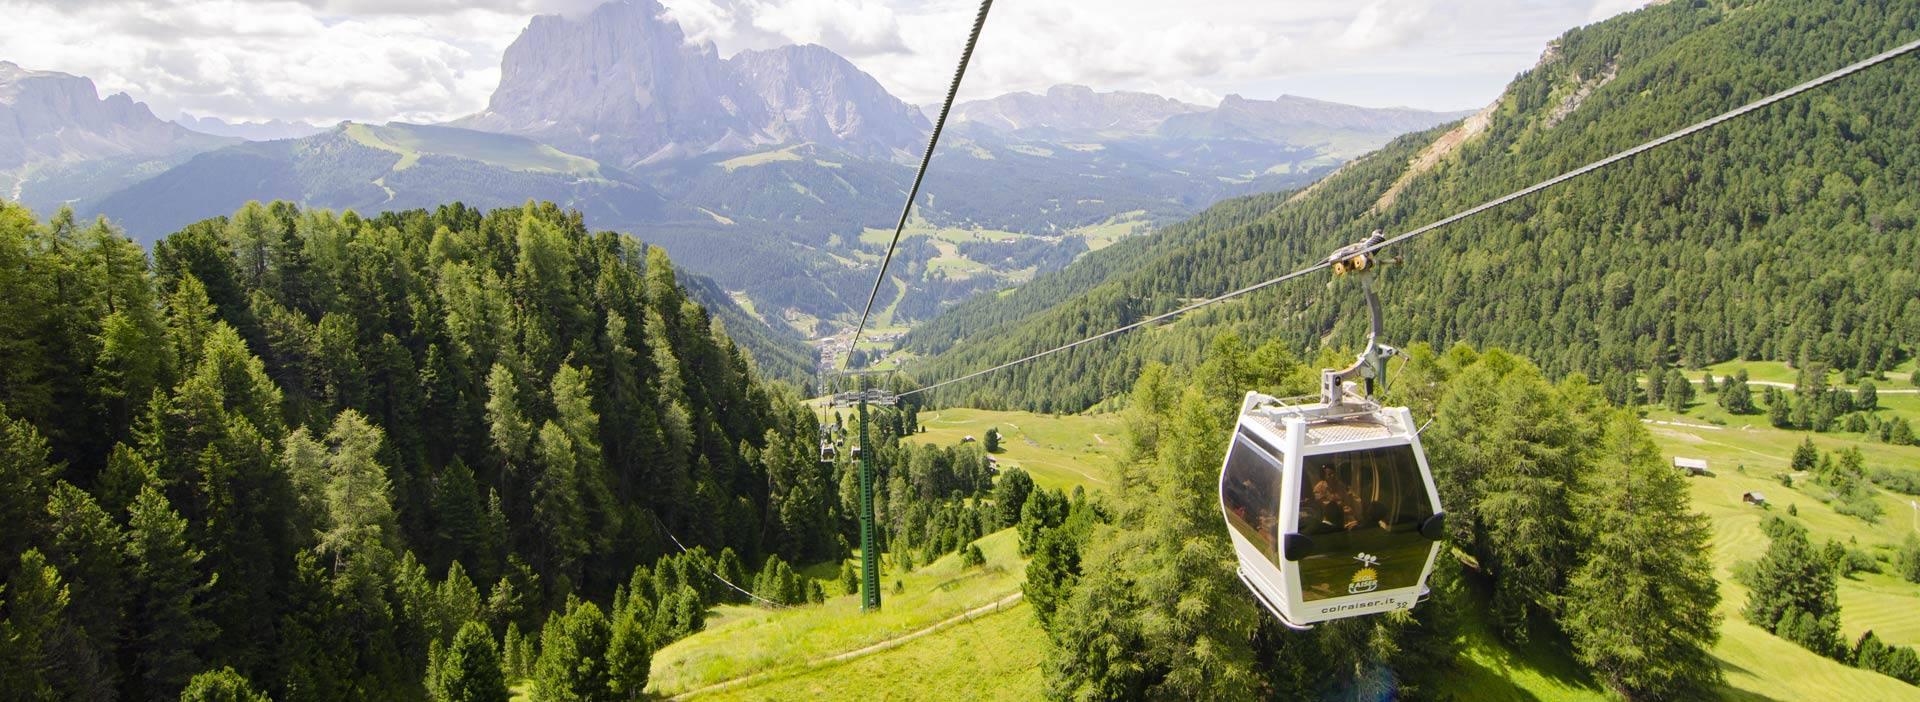 Umlaufbahn Col Raiser